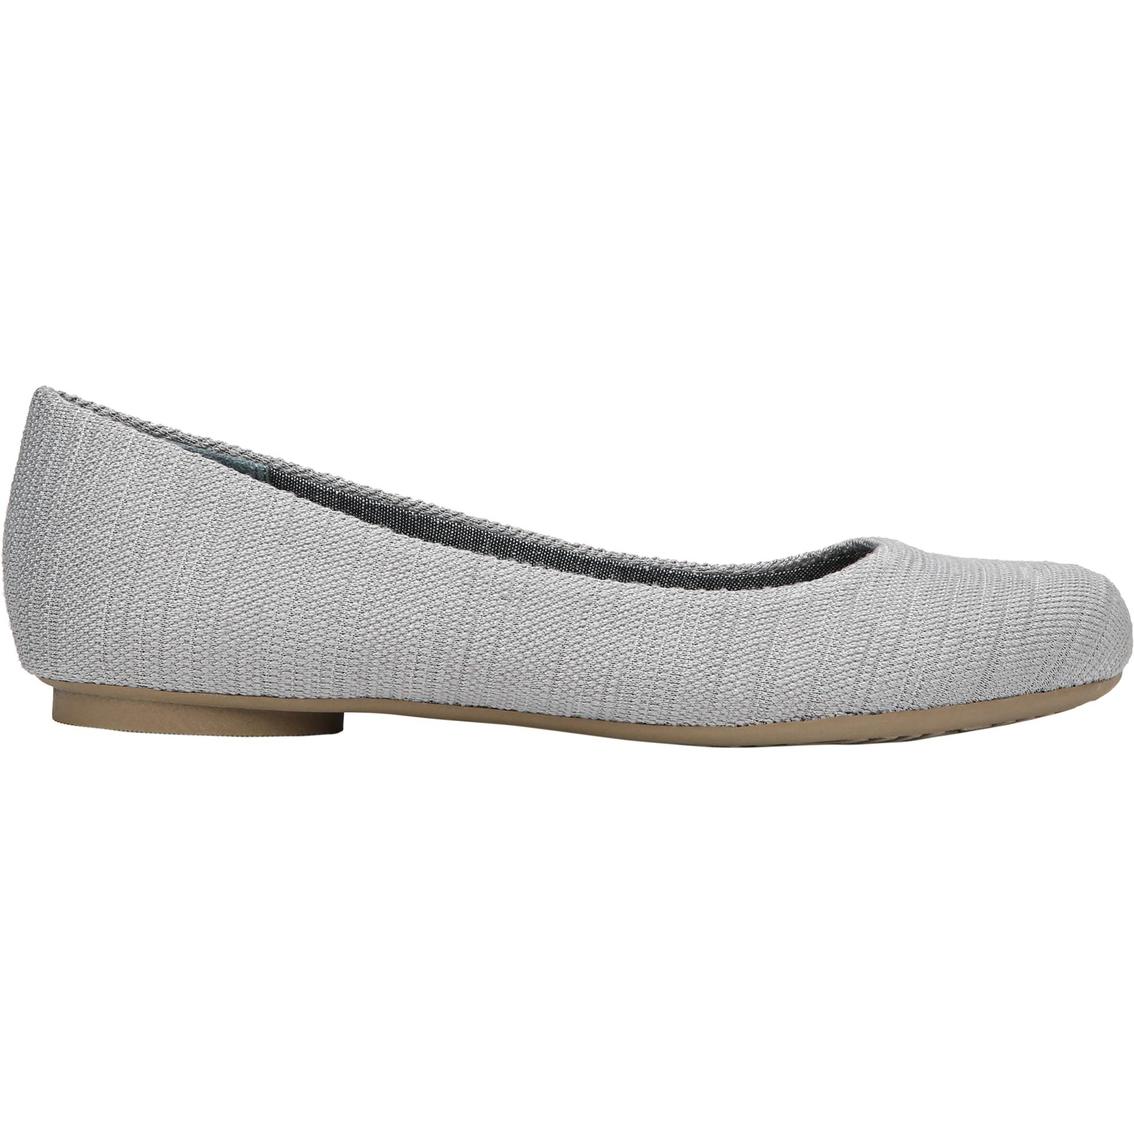 5b39f4e014a0 Dr. Scholl's Friendly 2 Round Toe Flats | Flats | Shoes | Shop The ...